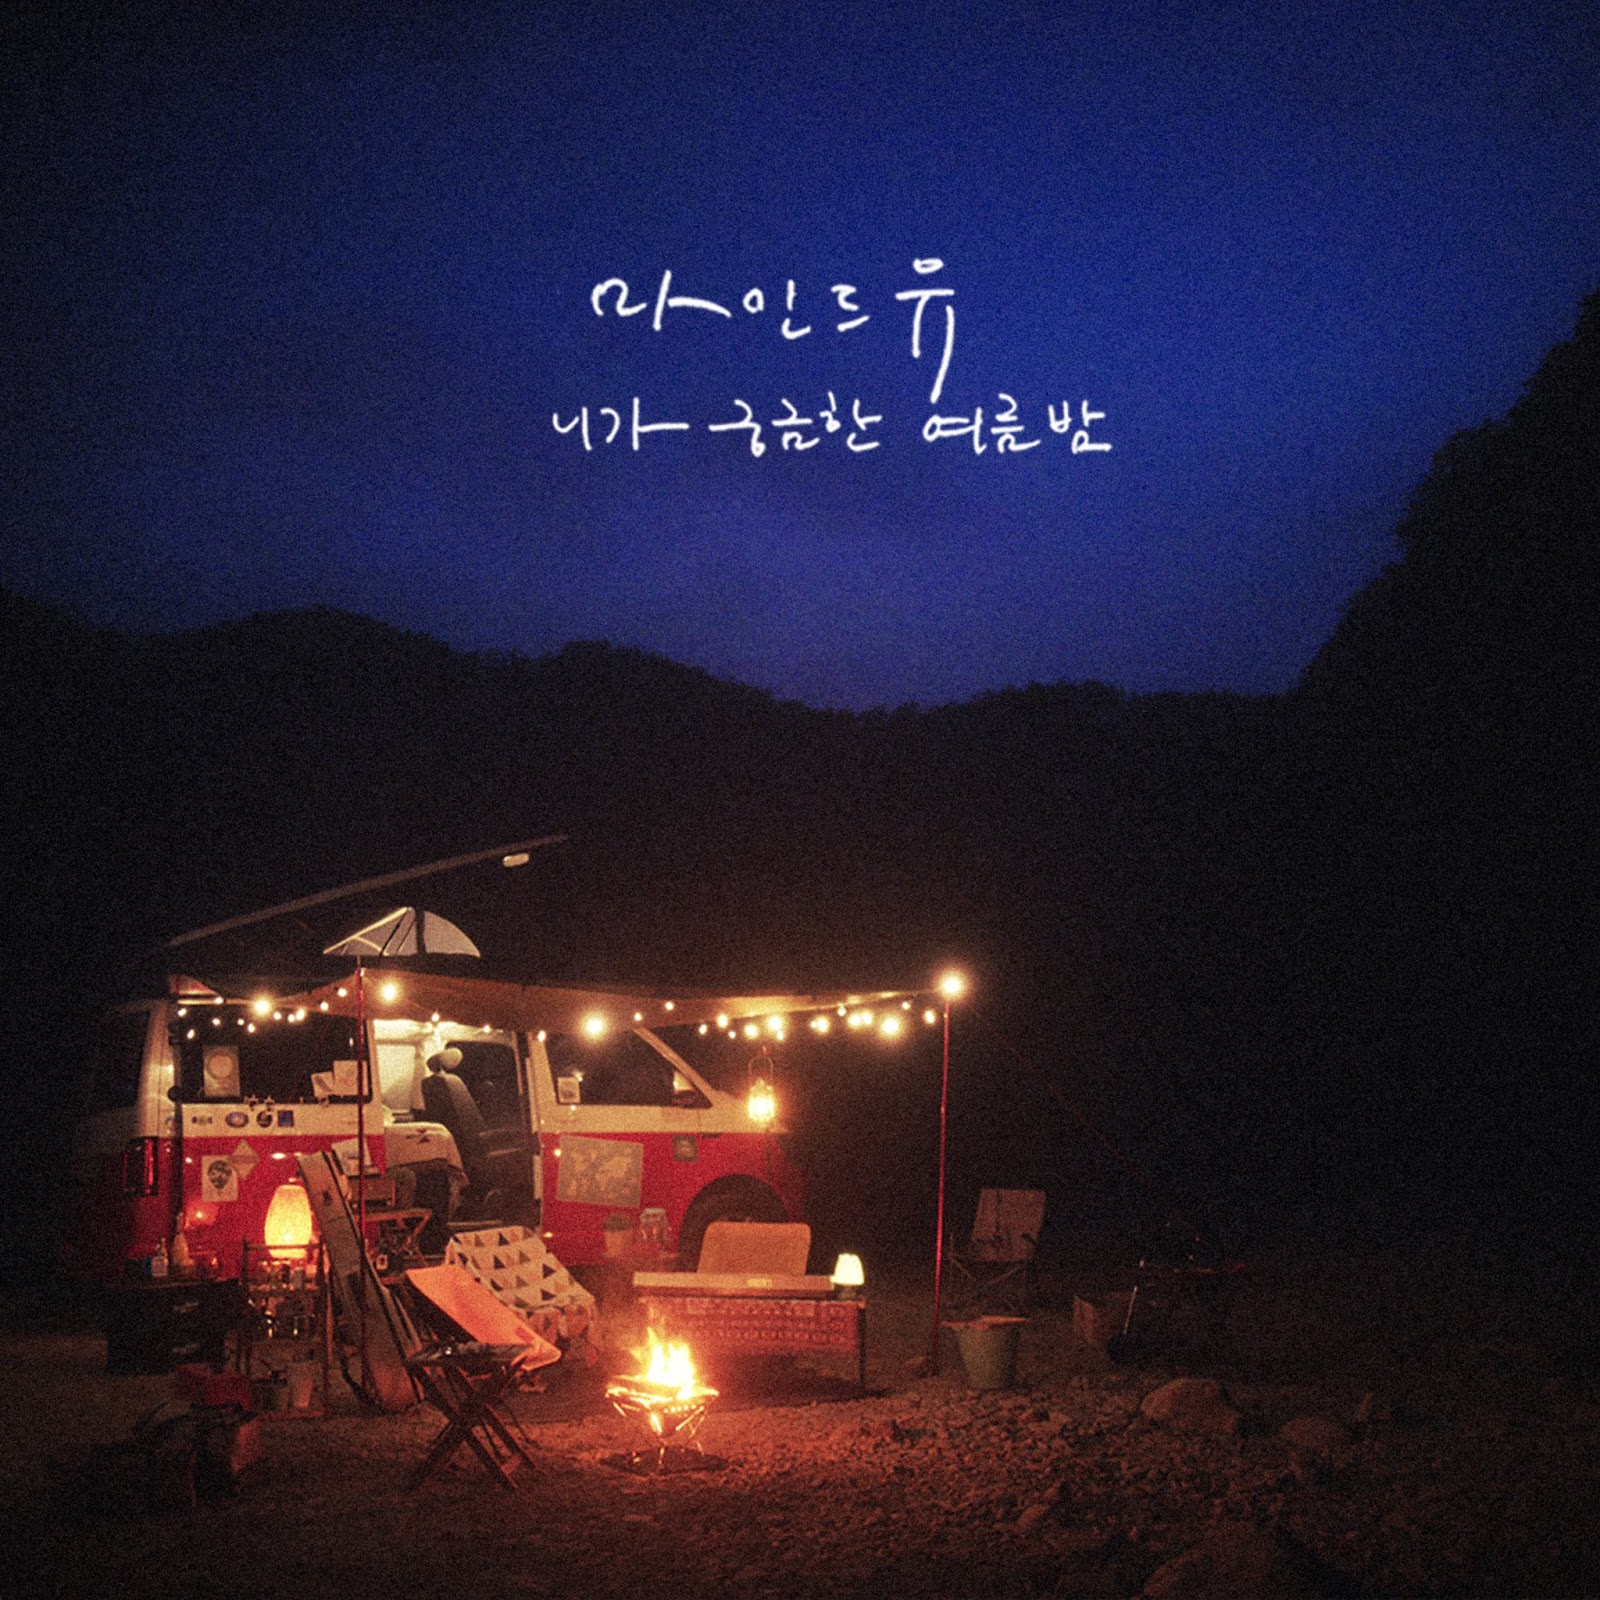 Mind U (마인드유) Summer Night Story (니가 궁금한 여름밤)